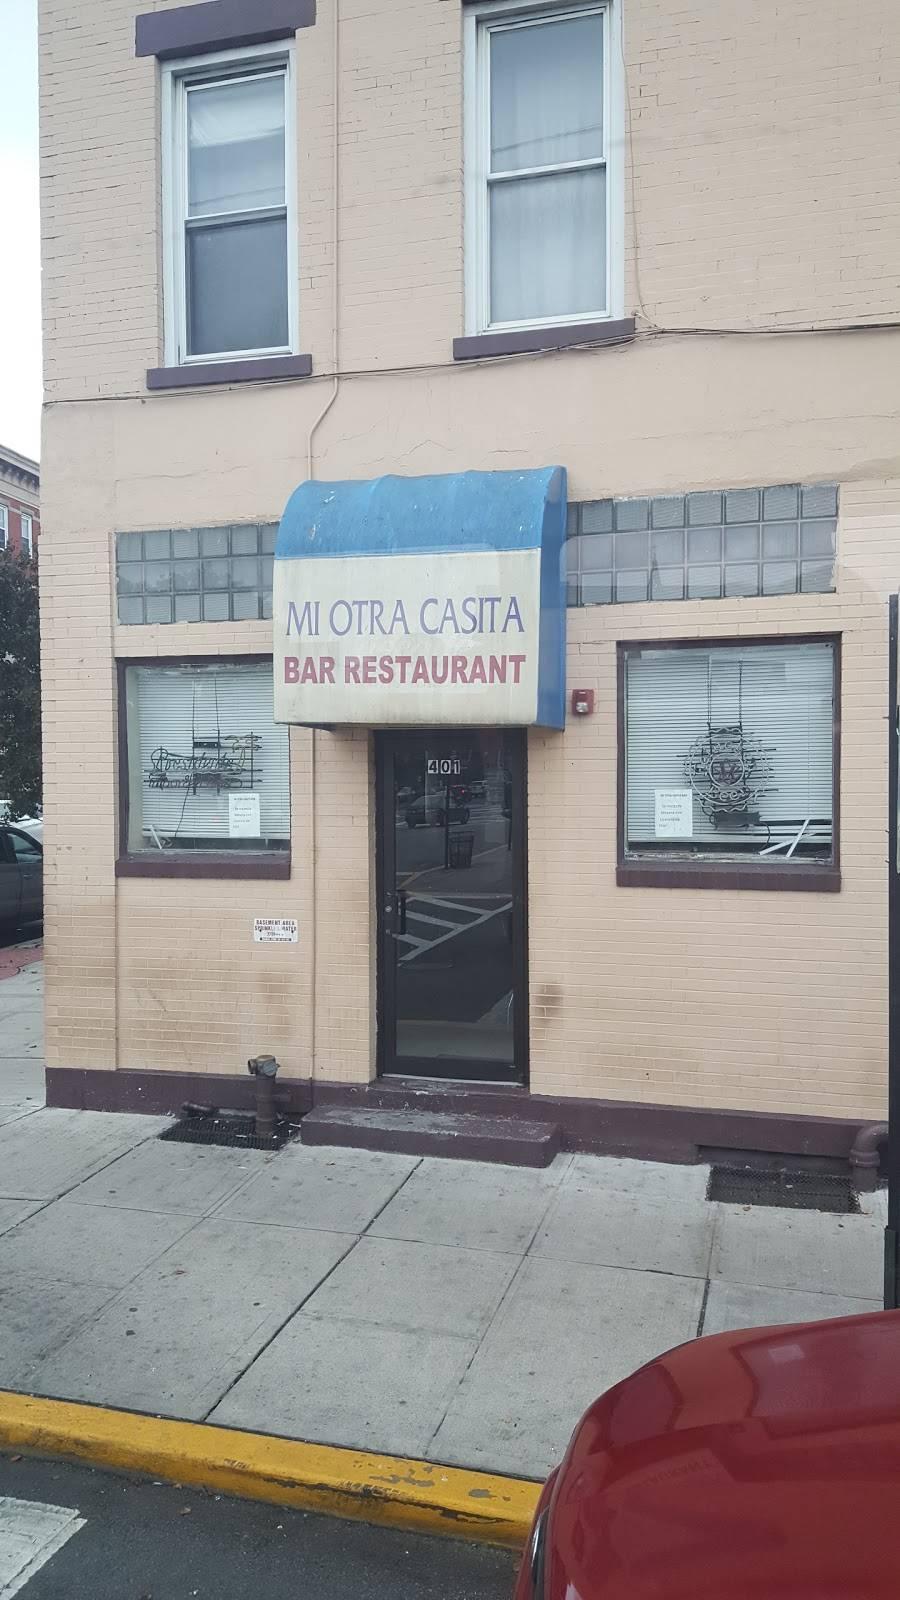 Mi Otra Casita | restaurant | 401 30th St, Union City, NJ 07087, USA